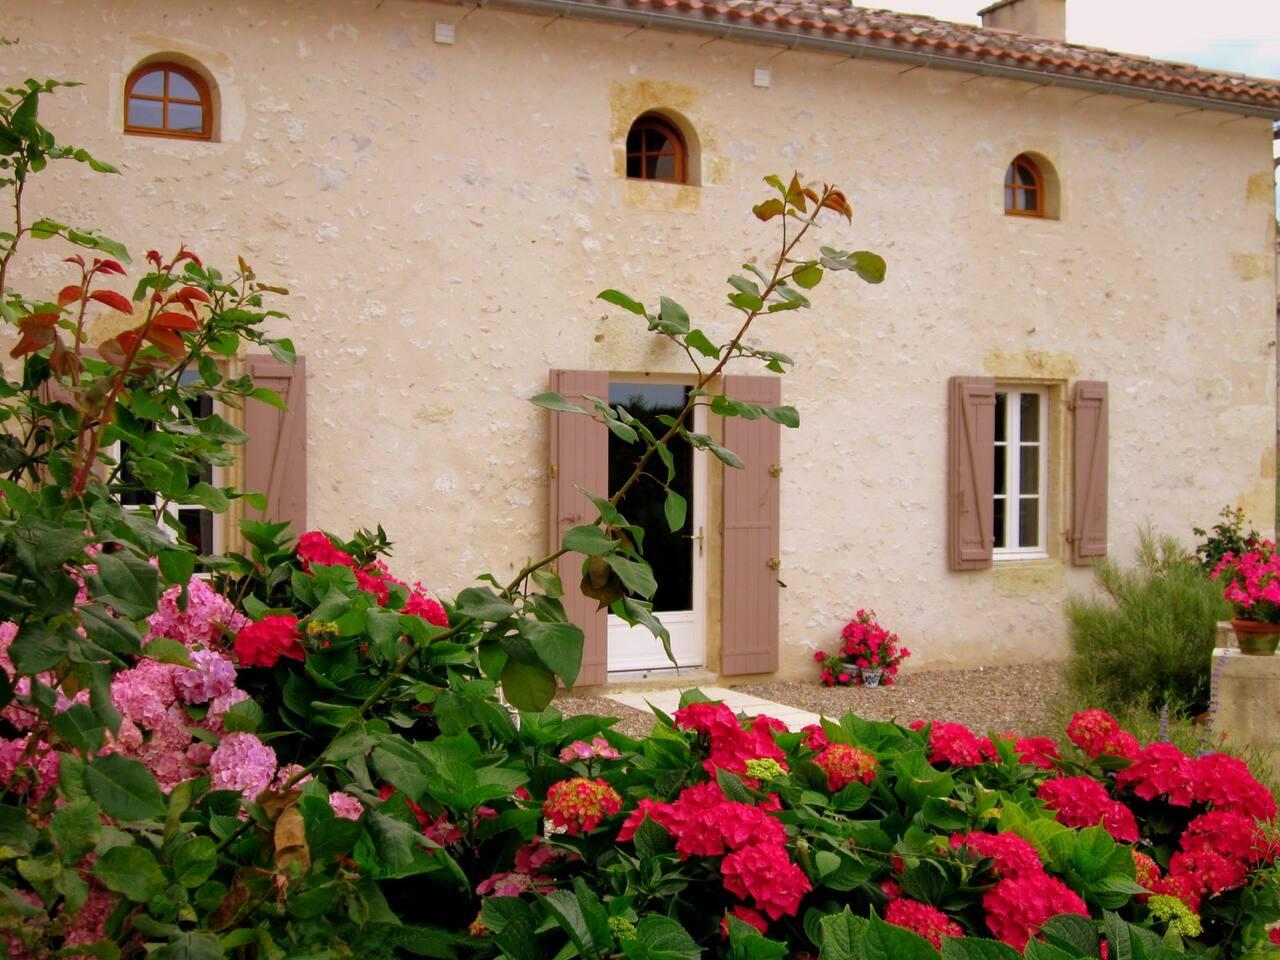 The flower filled front court yard garden